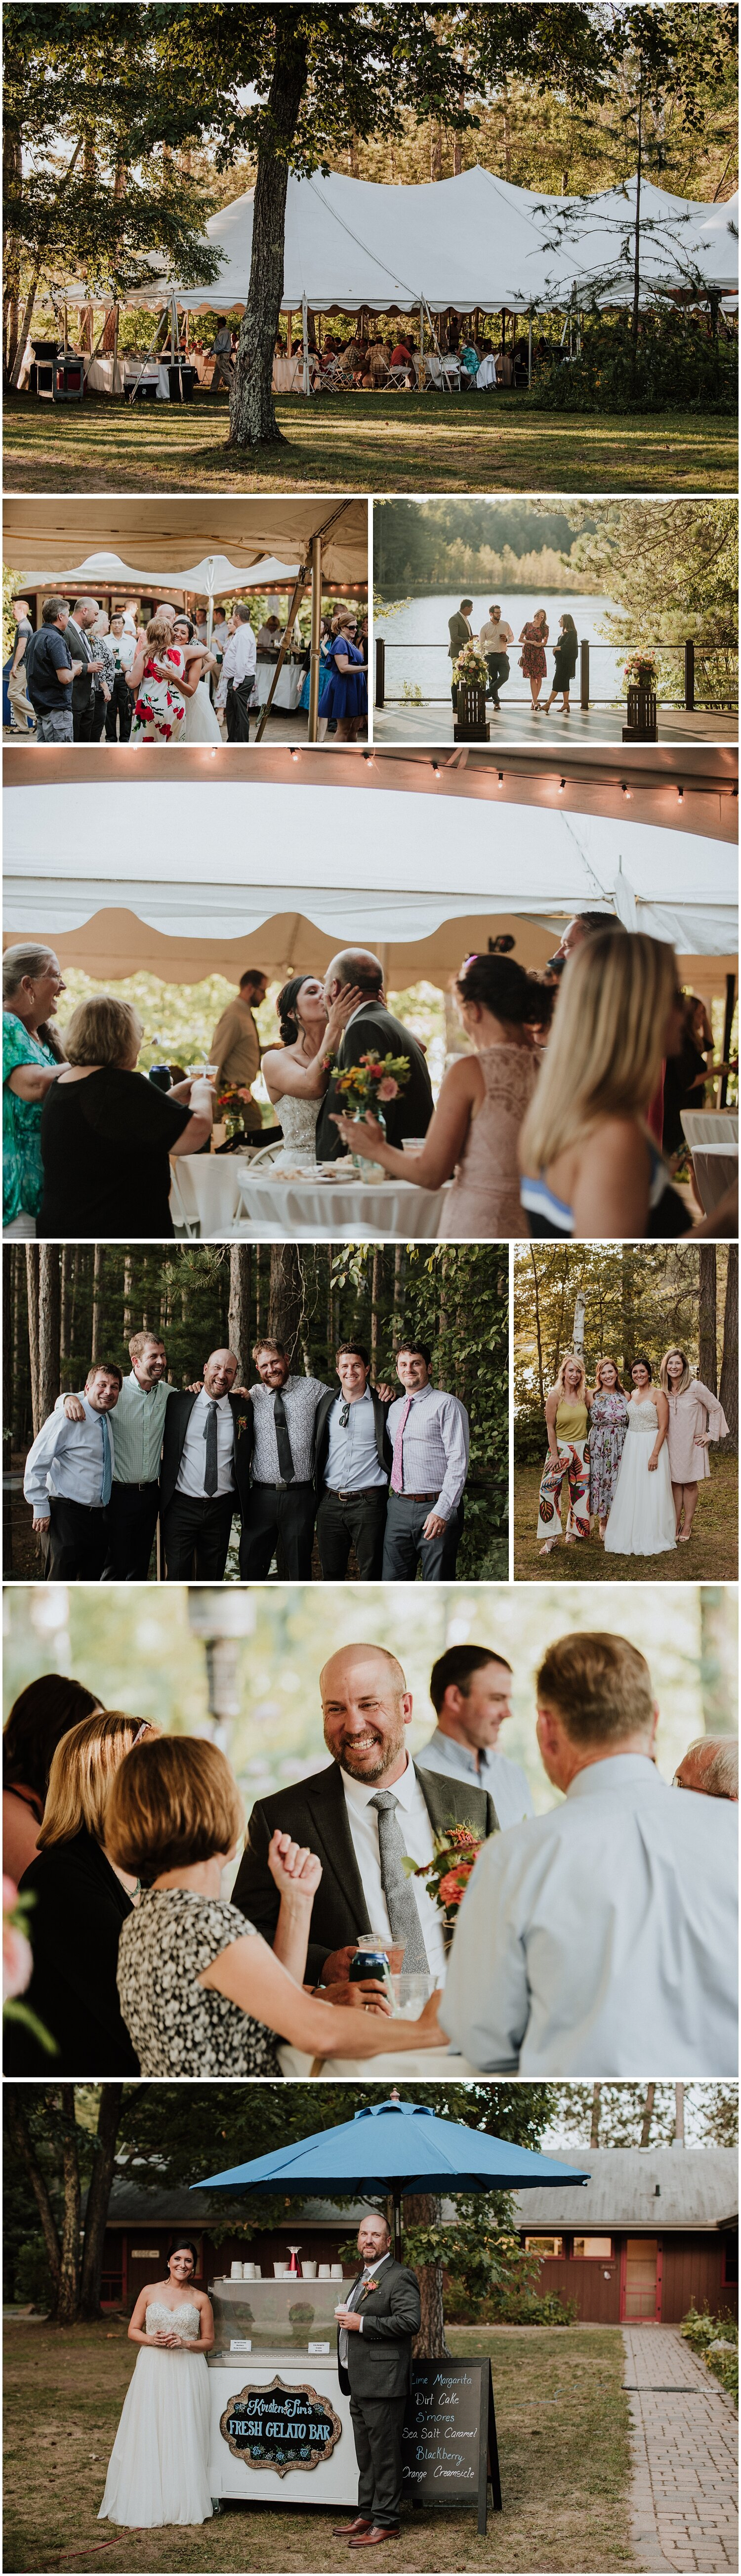 manitowish-waters-wedding_0077.jpg